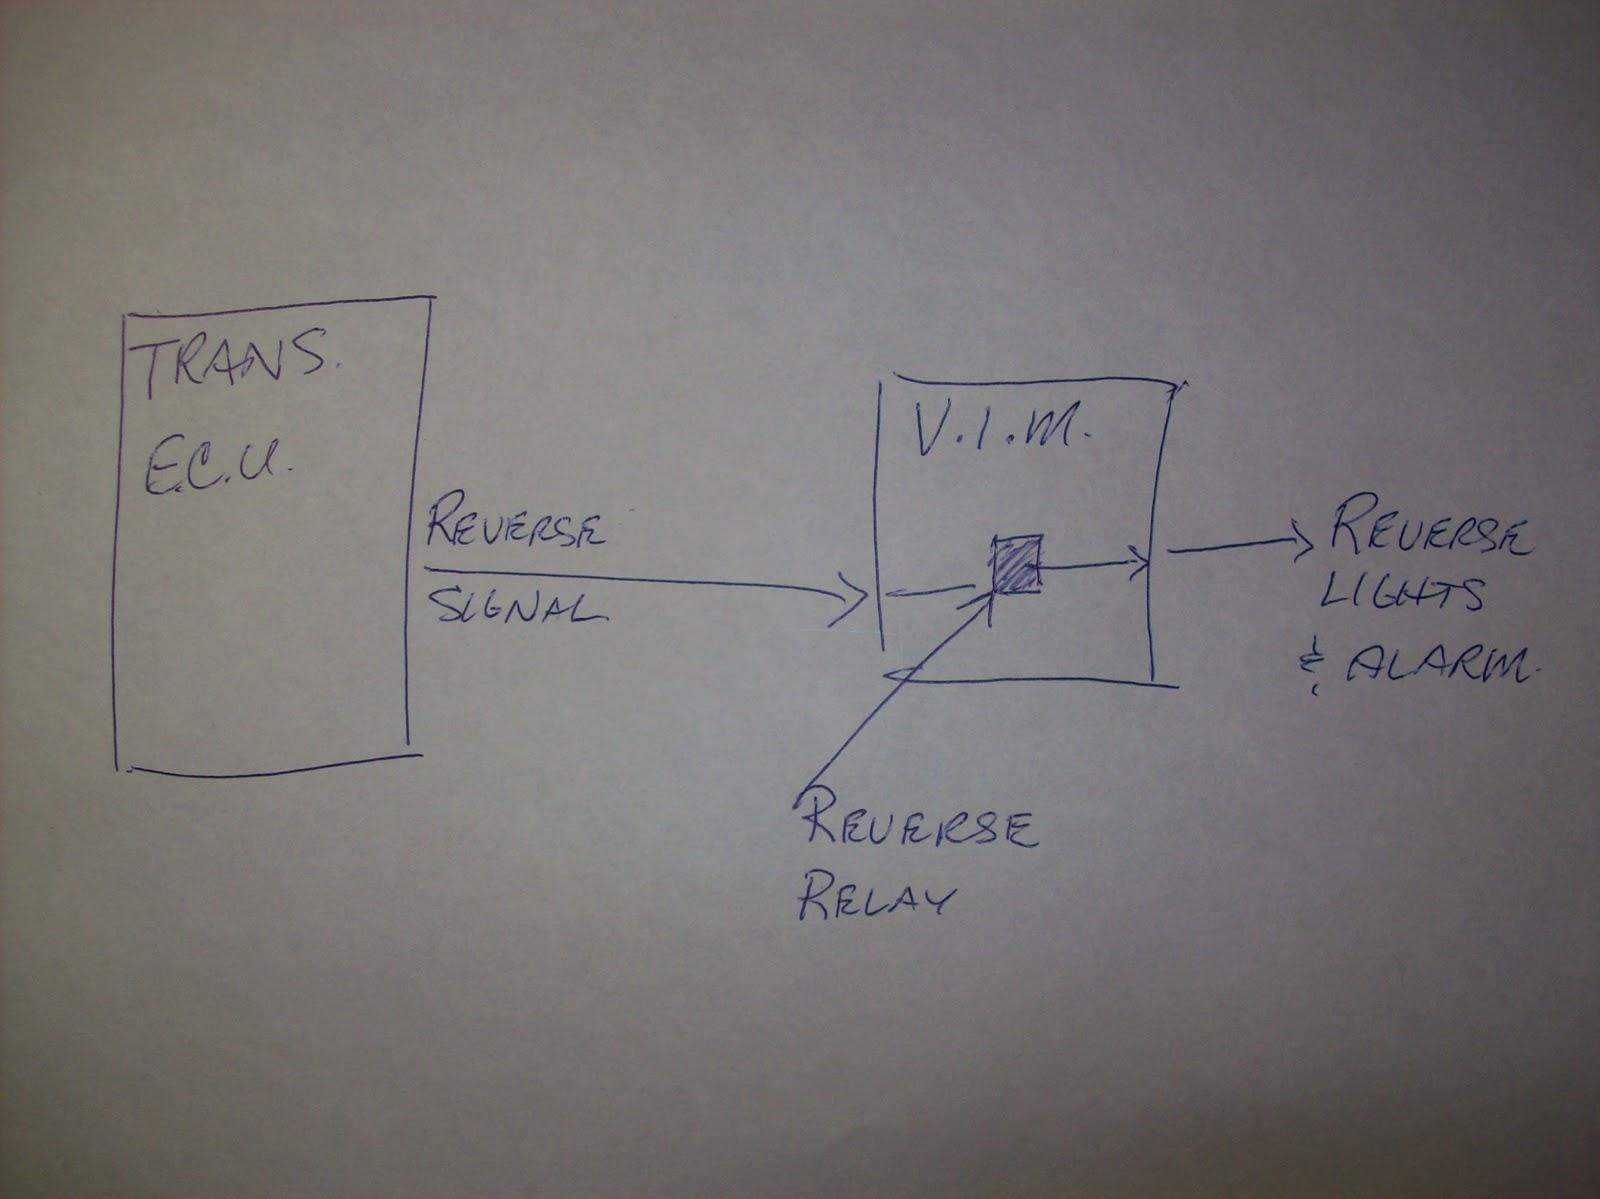 Transmission Wiring Diagram Further Allison Wtec 3 Transmission Wiring